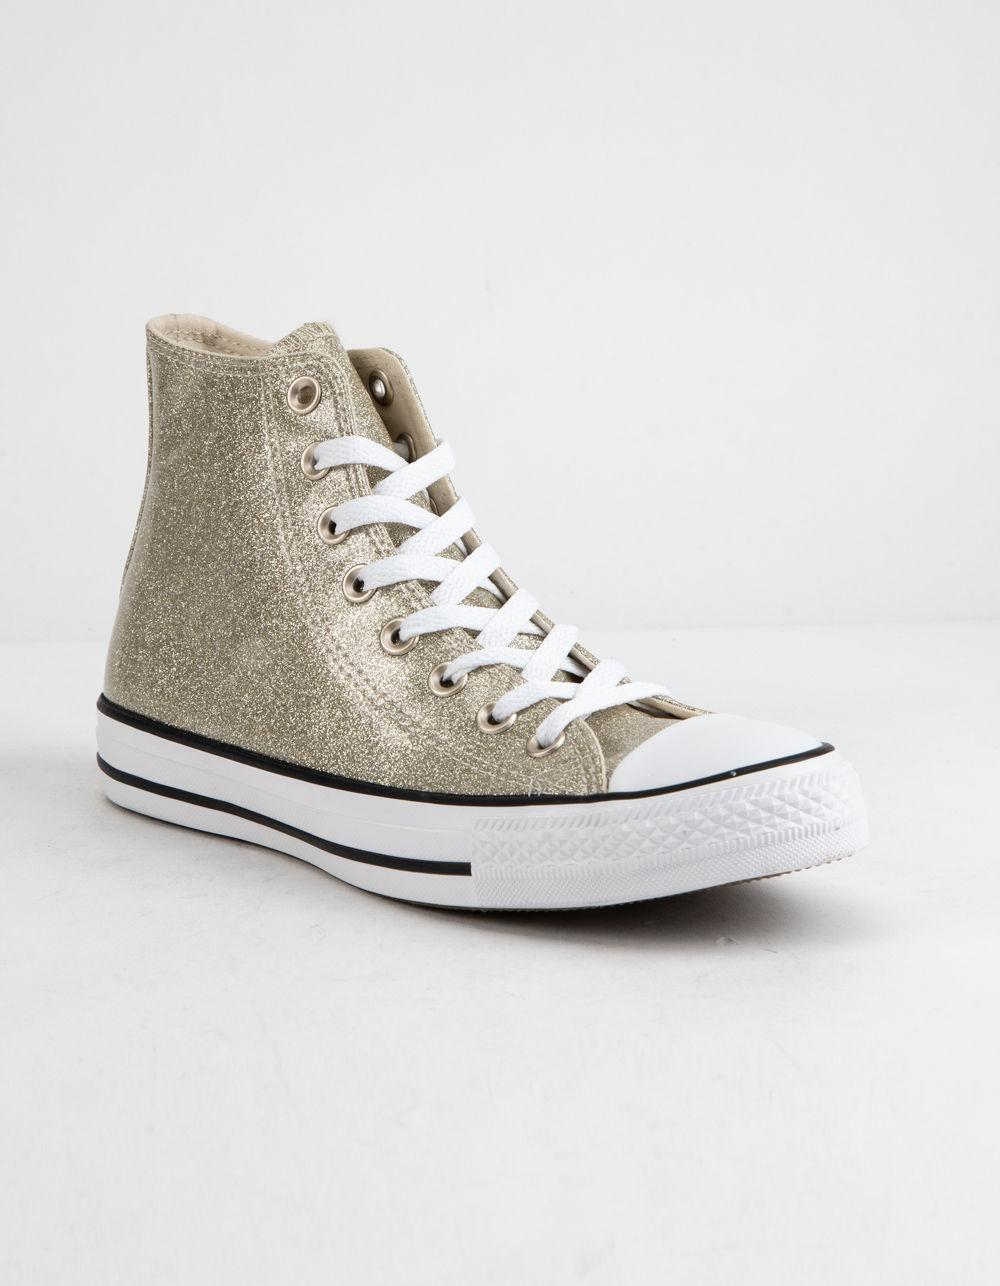 27116aa38eb0 Lyst - Converse Chuck Taylor All Star Wonderworld High Top Womens Shoes in  Metallic